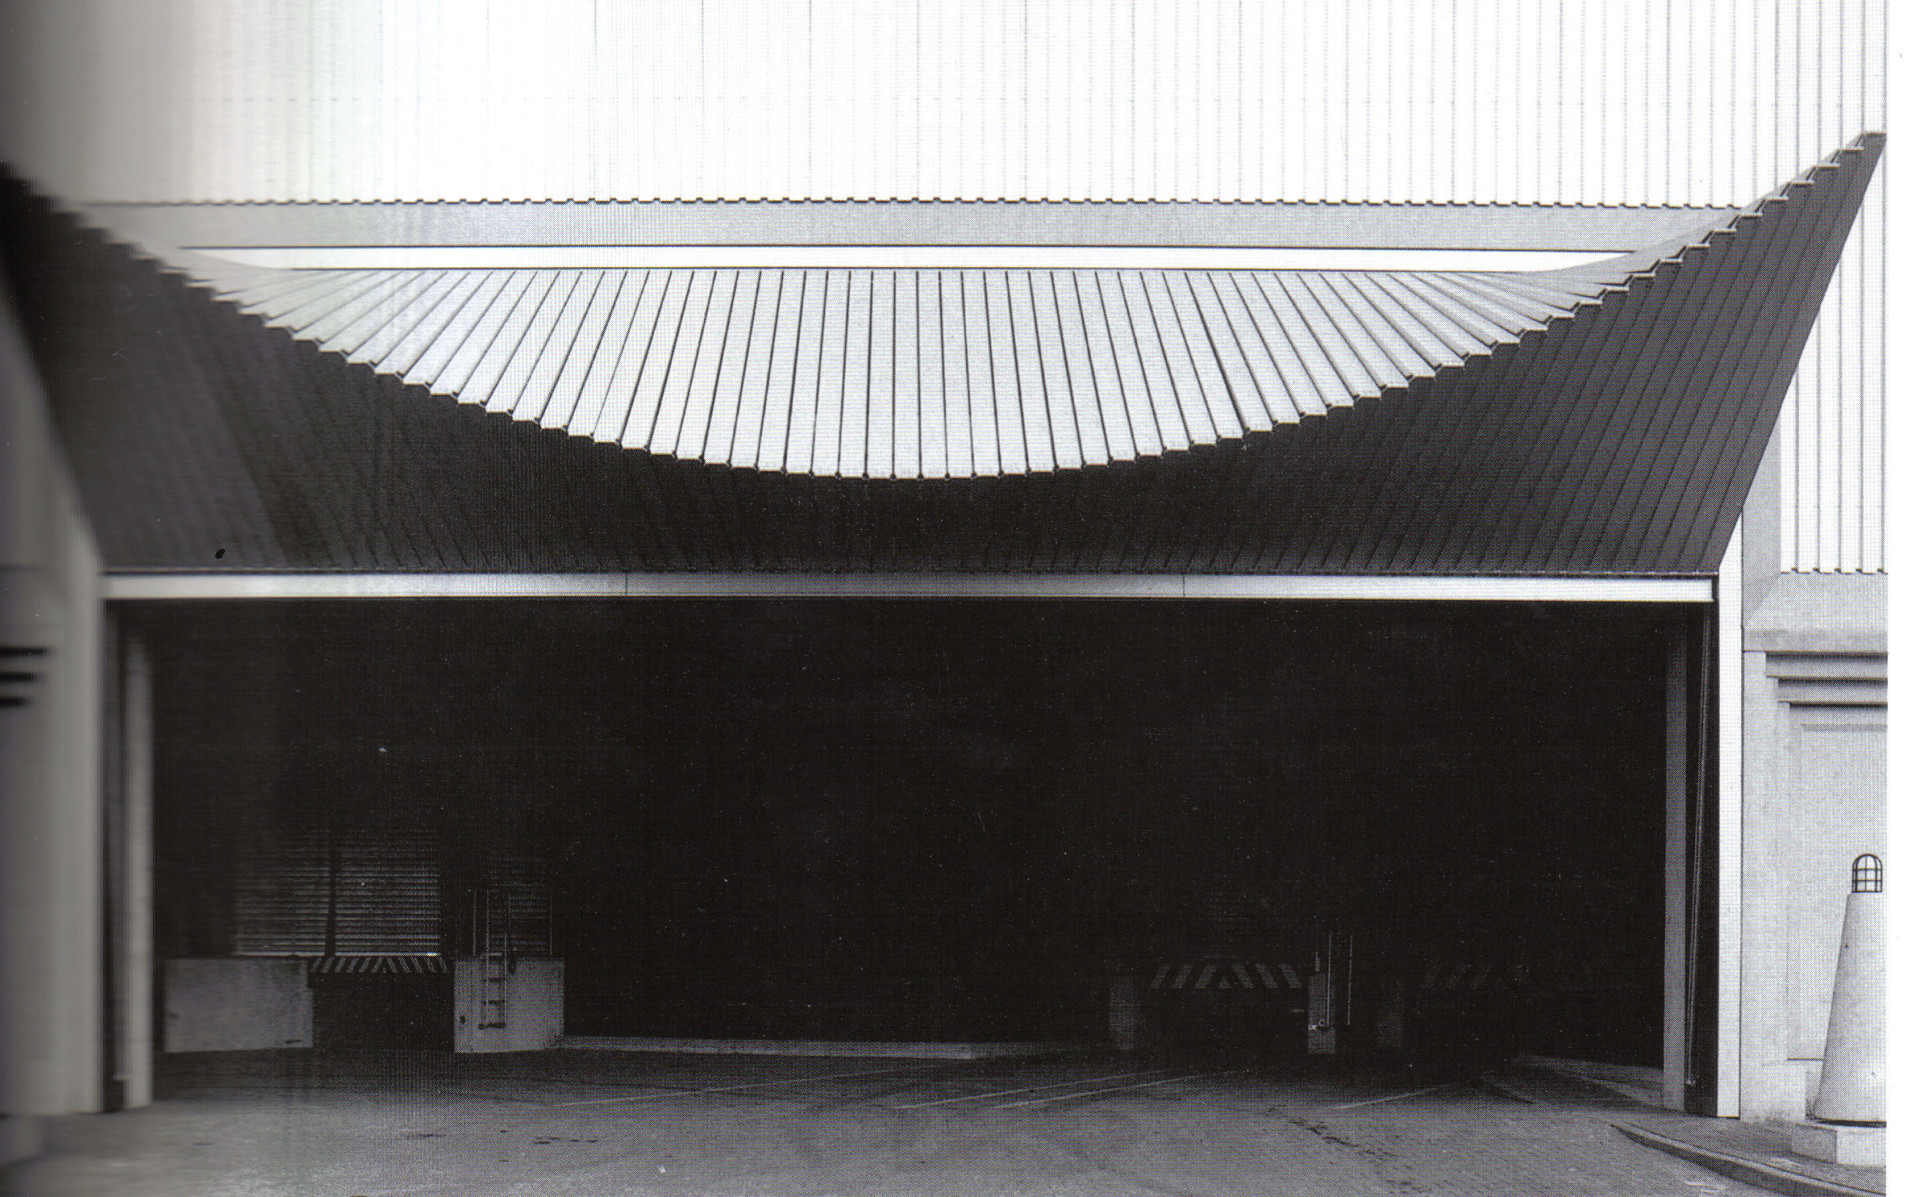 Calatrava S Garage Door Parts Labor